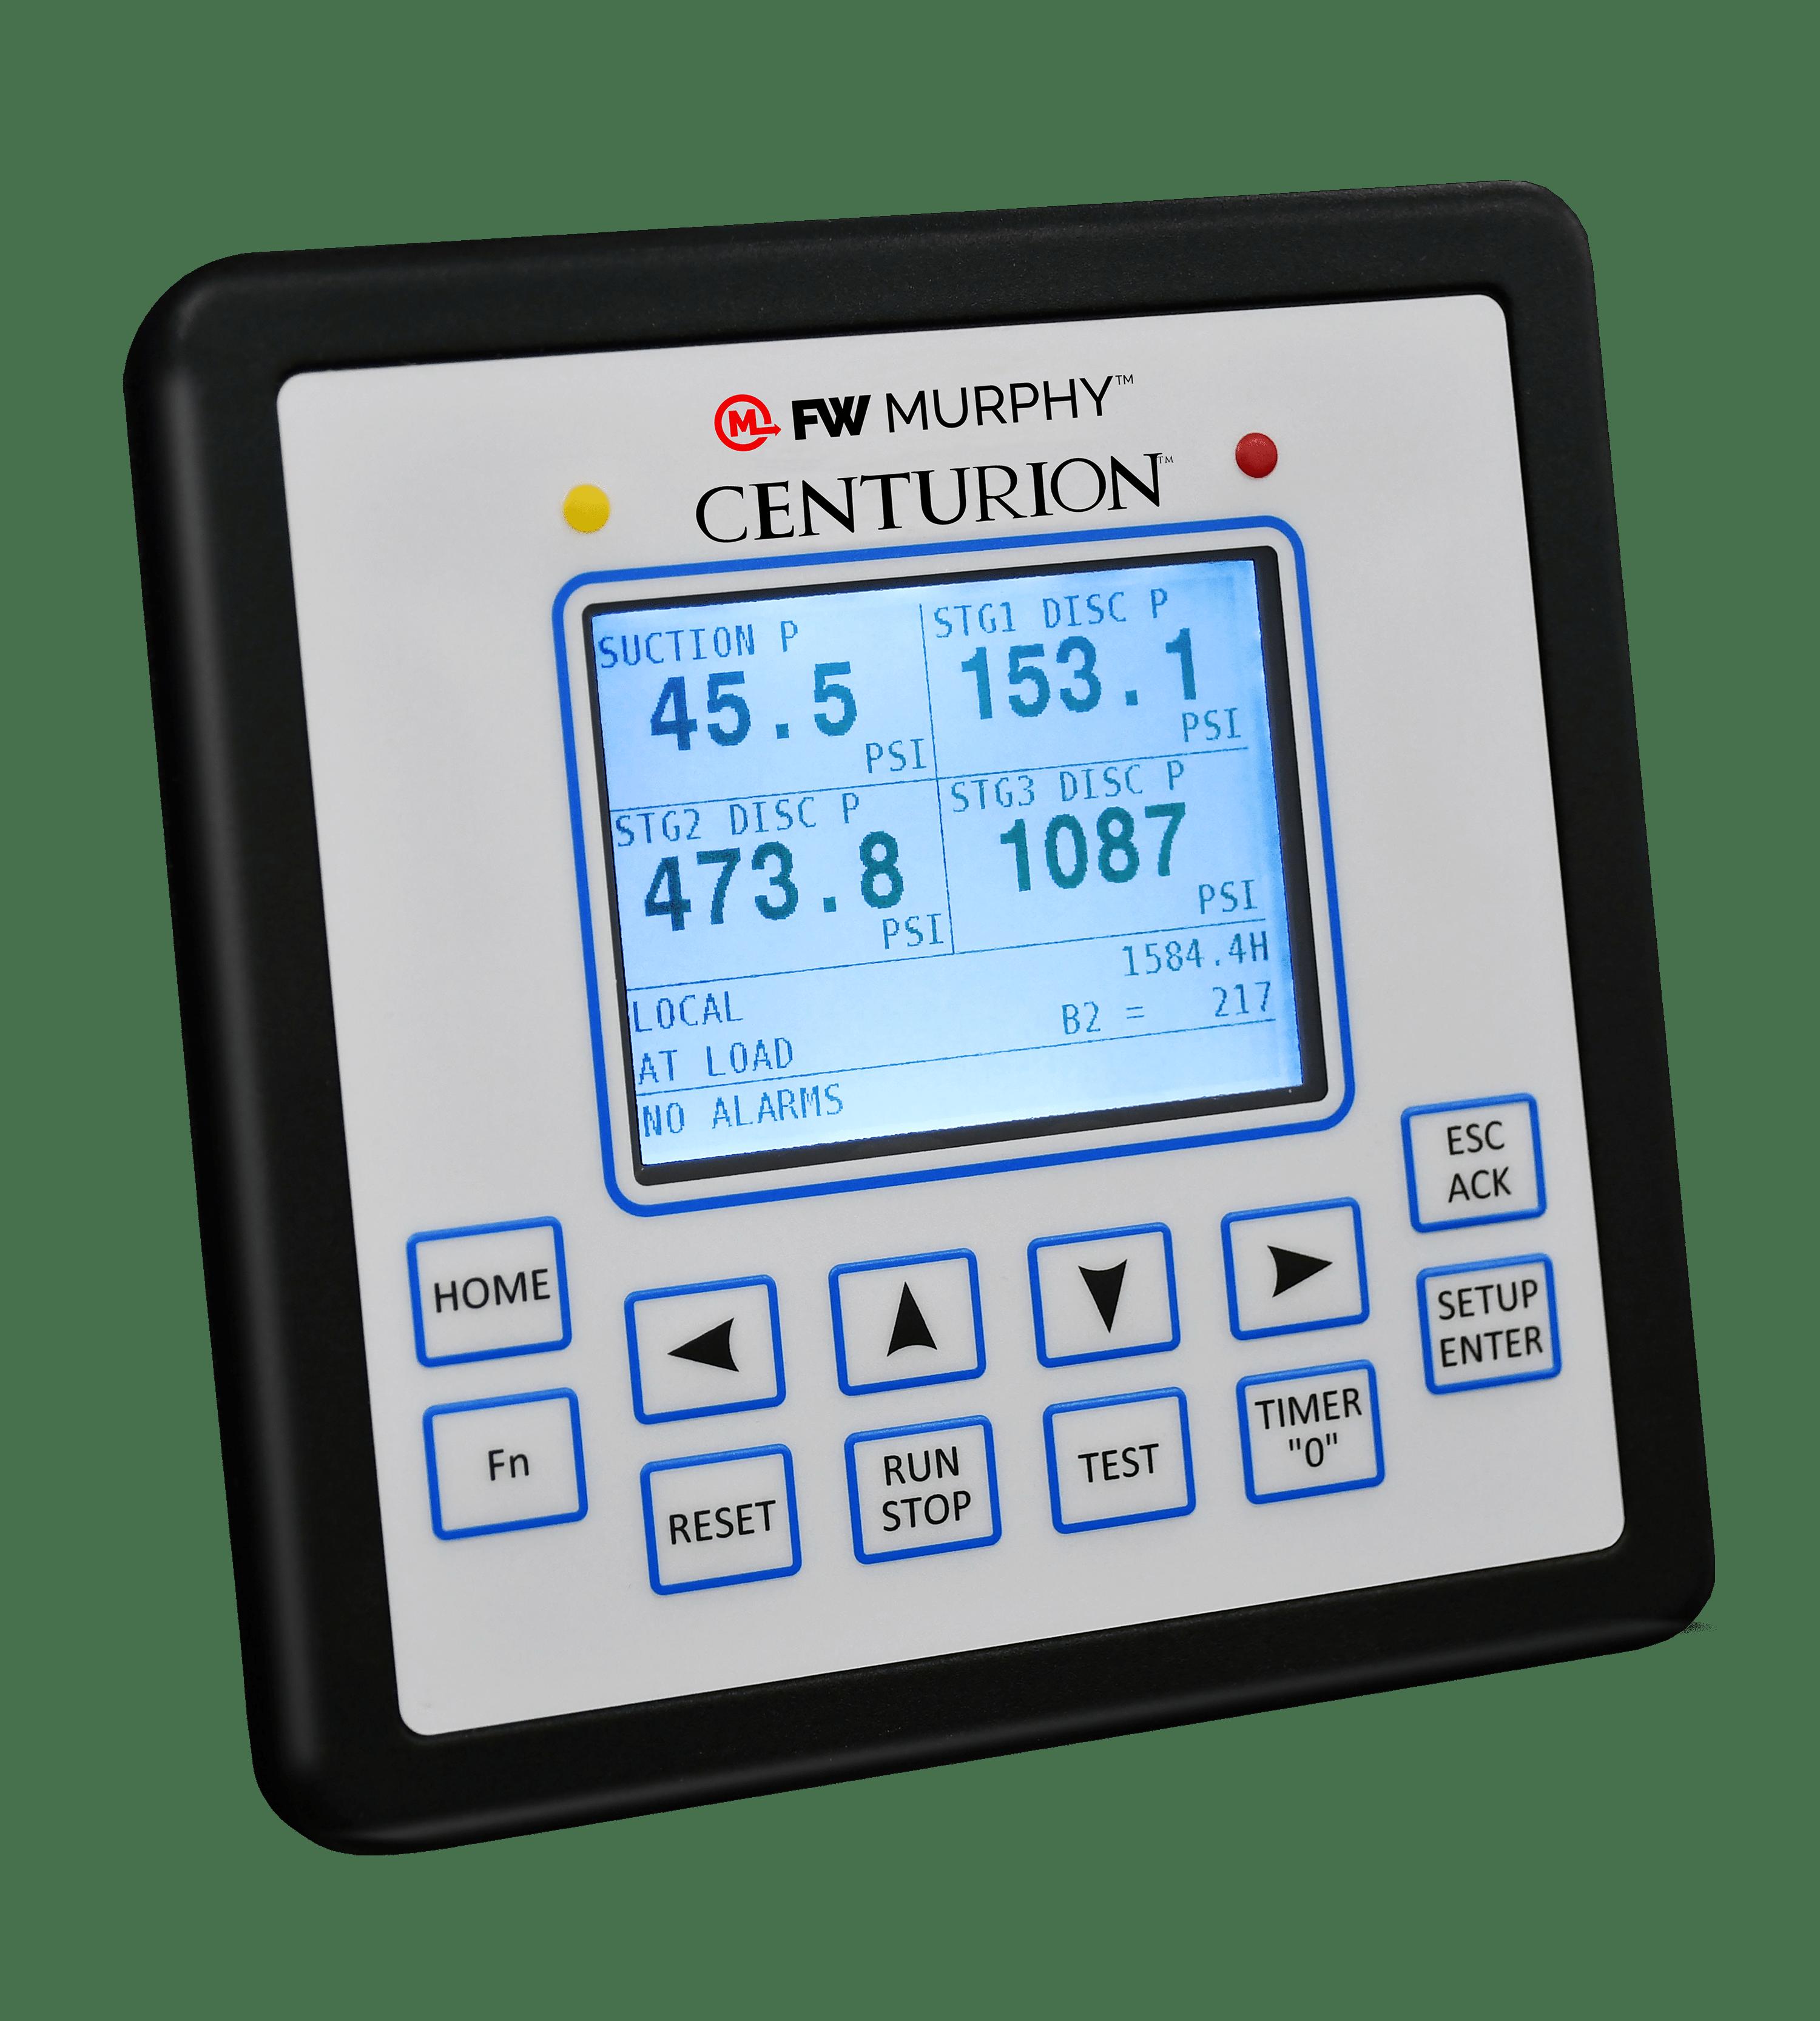 Centurion C4 Image